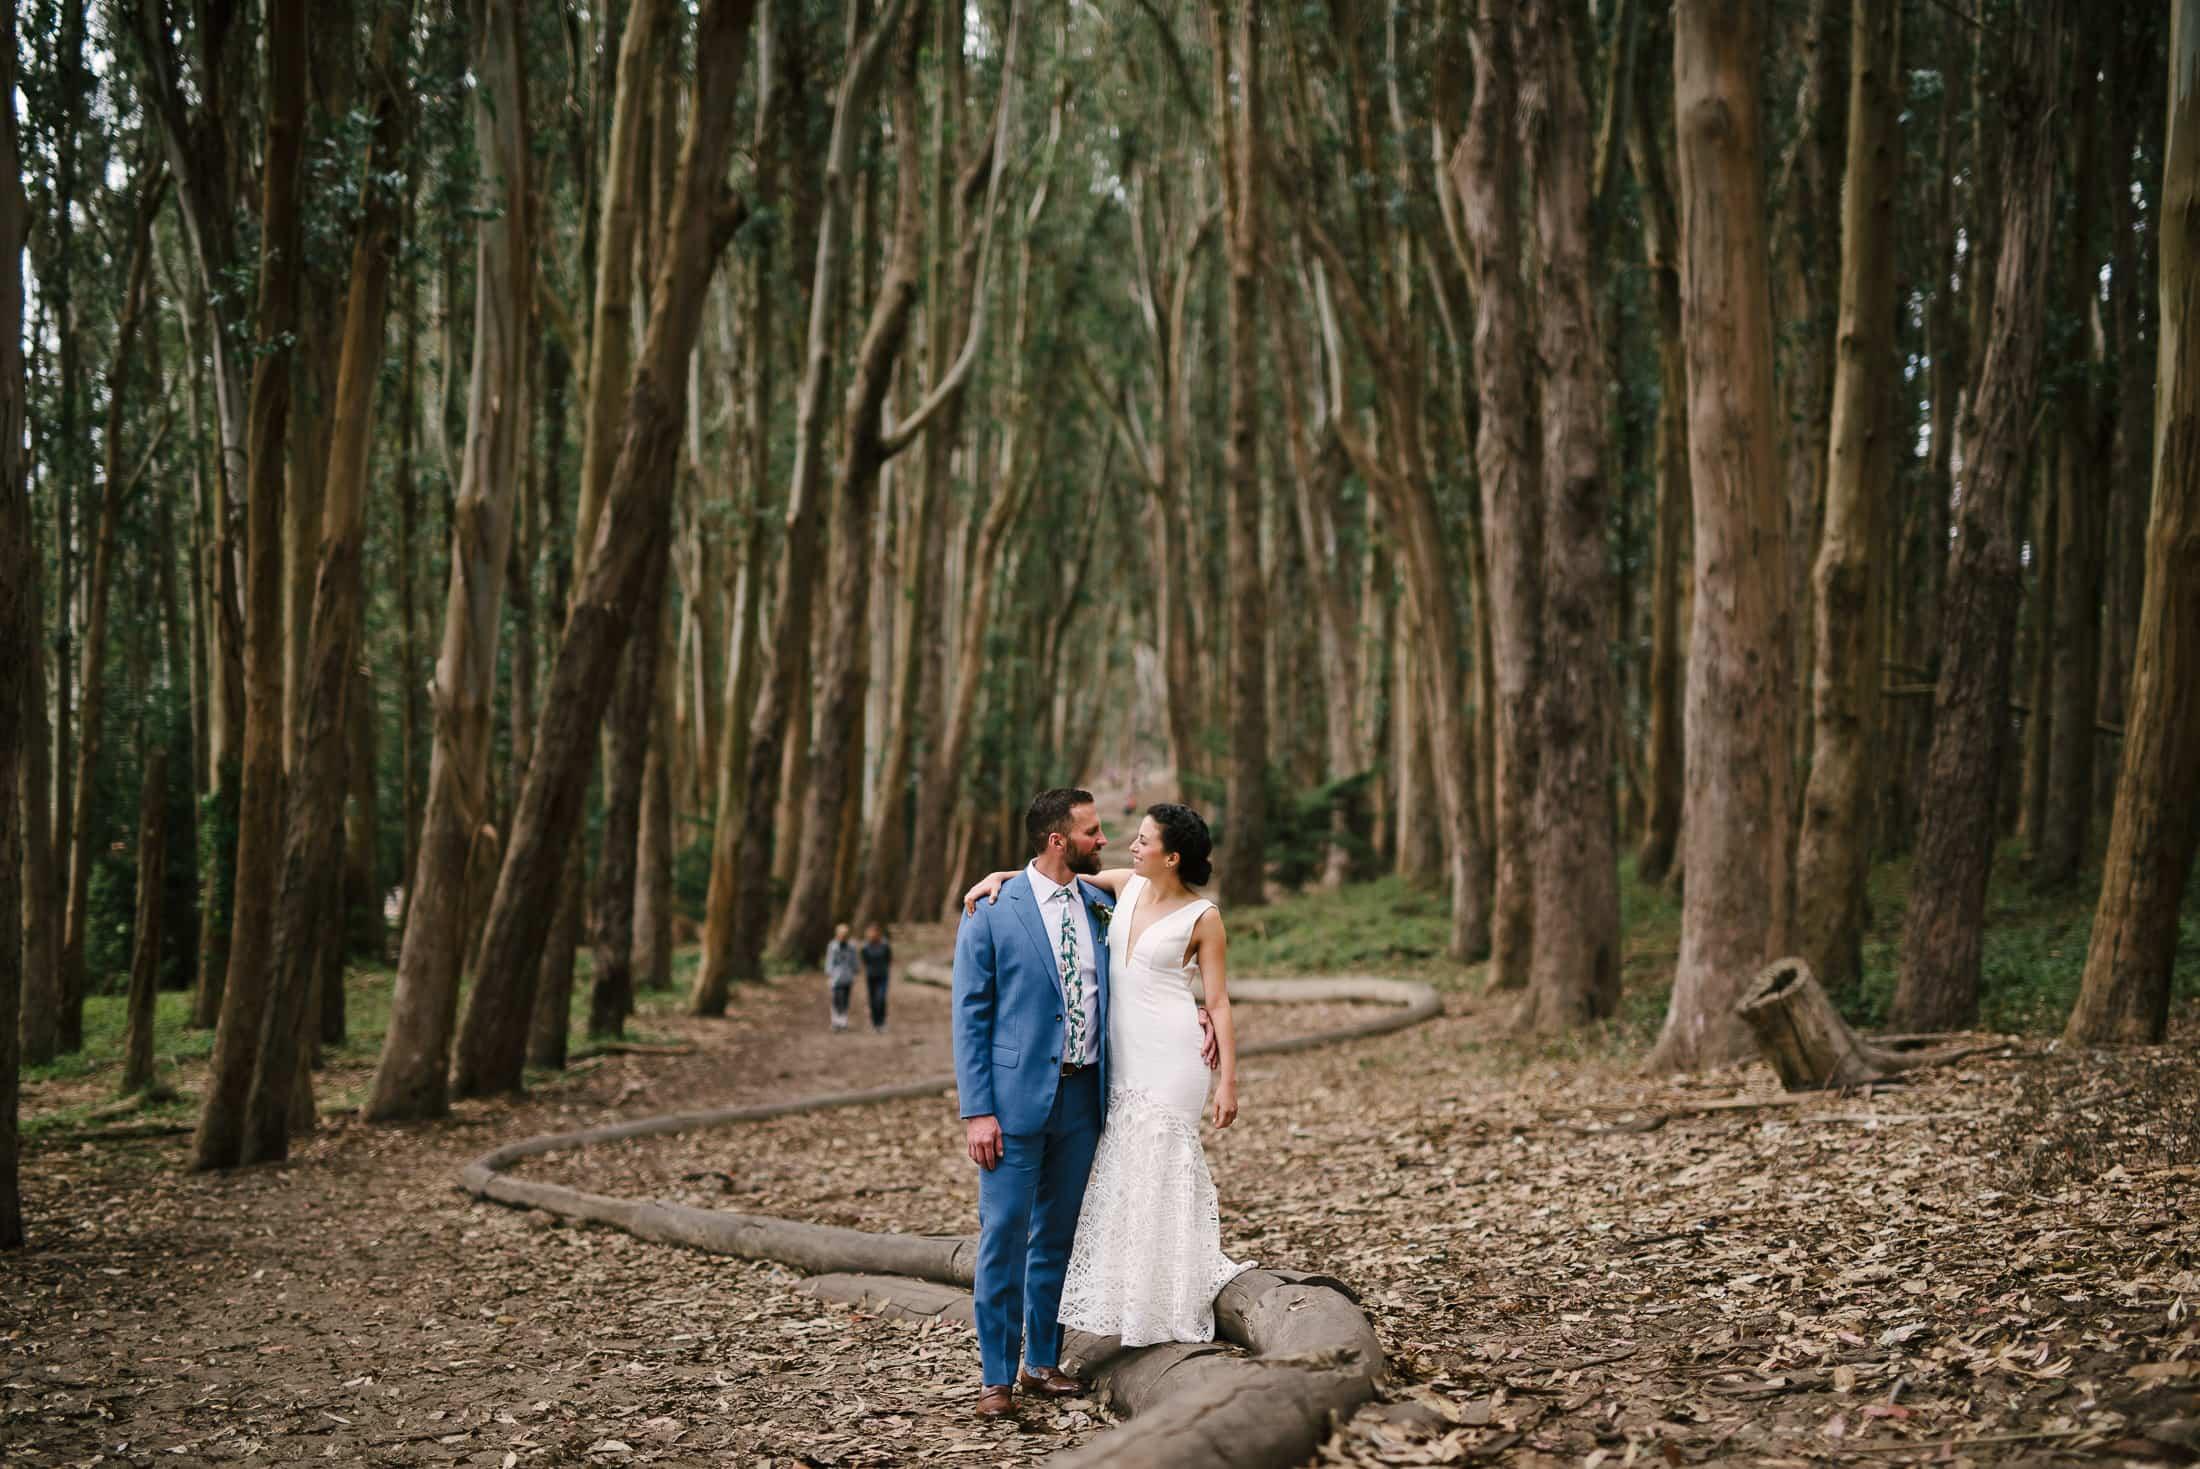 Wood line wedding portraits